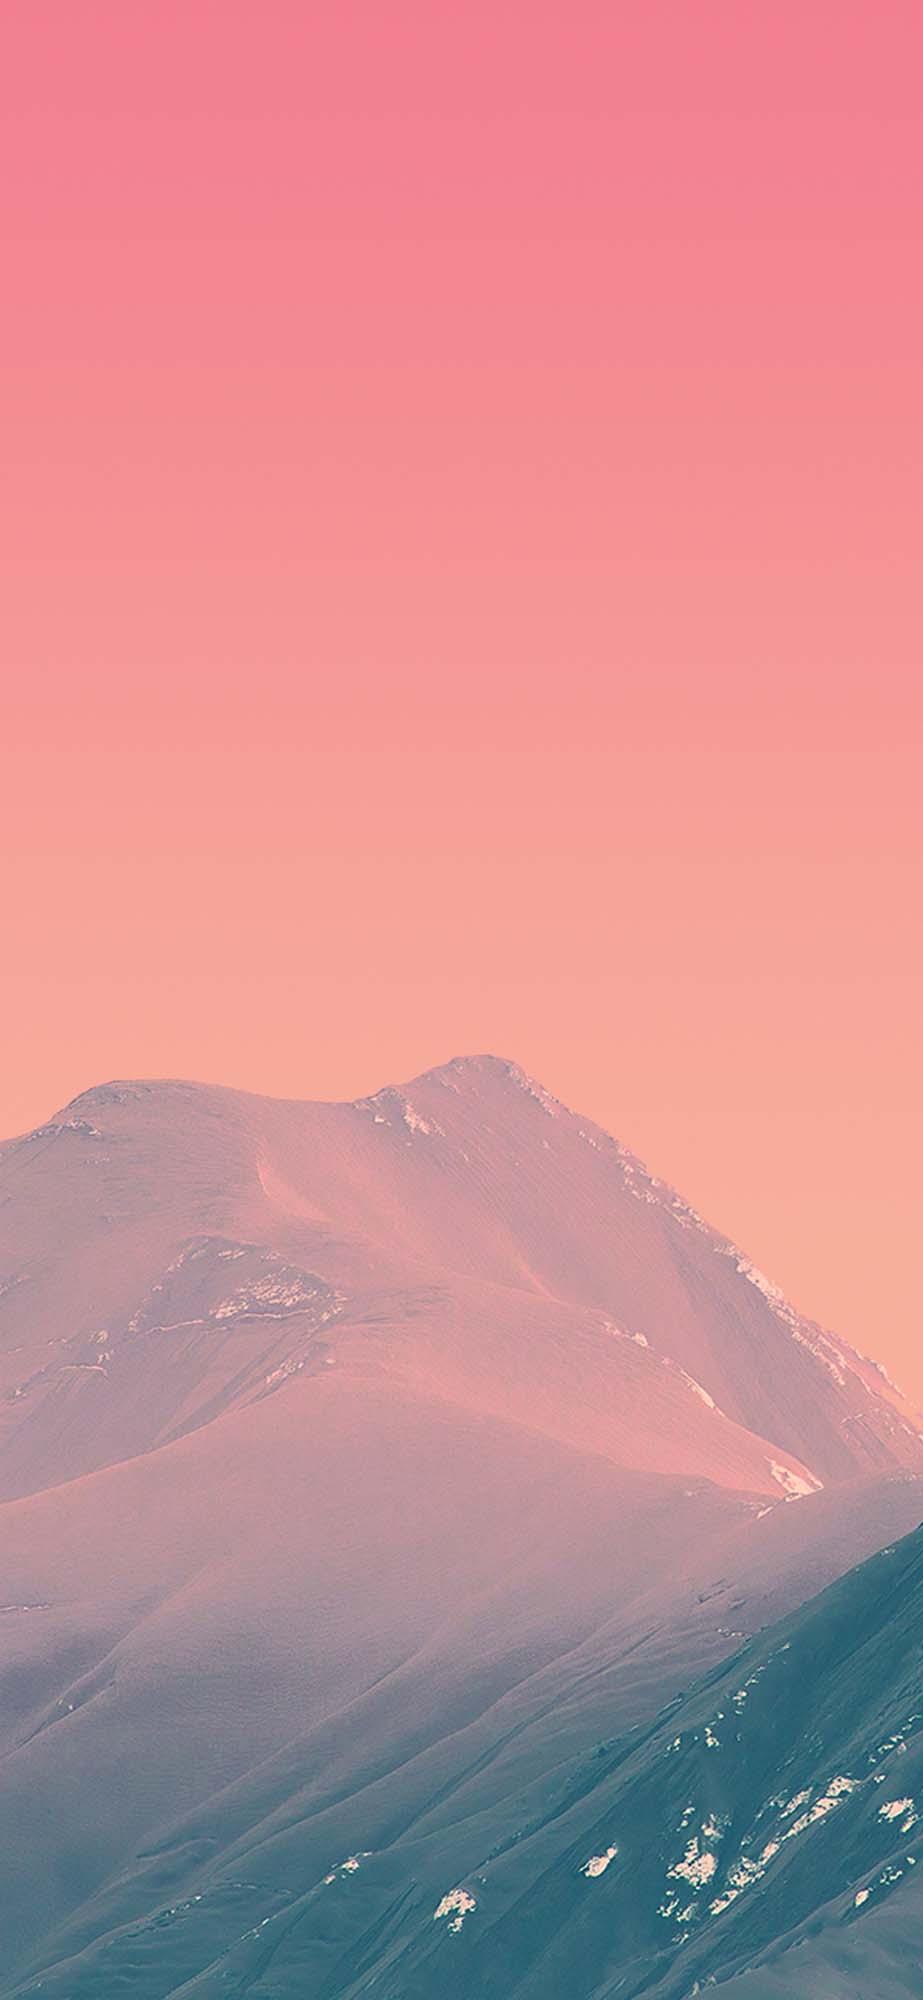 Oppo Art+ Wallpaper (15) TechFoogle